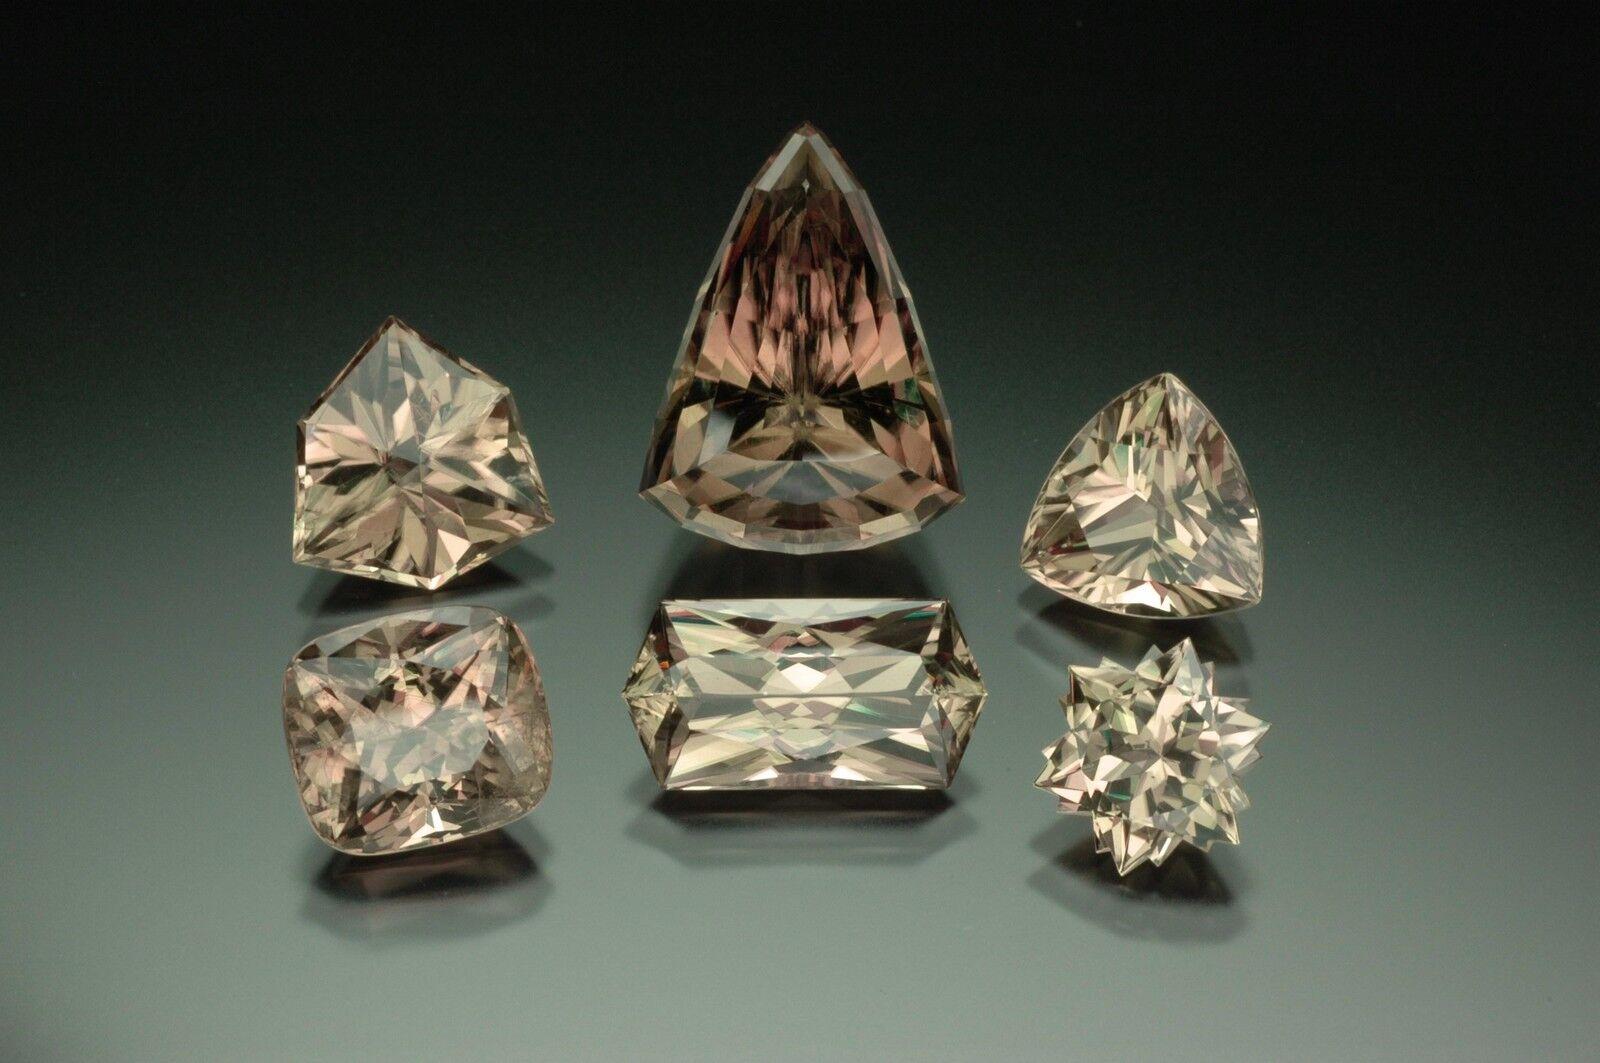 Zultanite Gems LLC